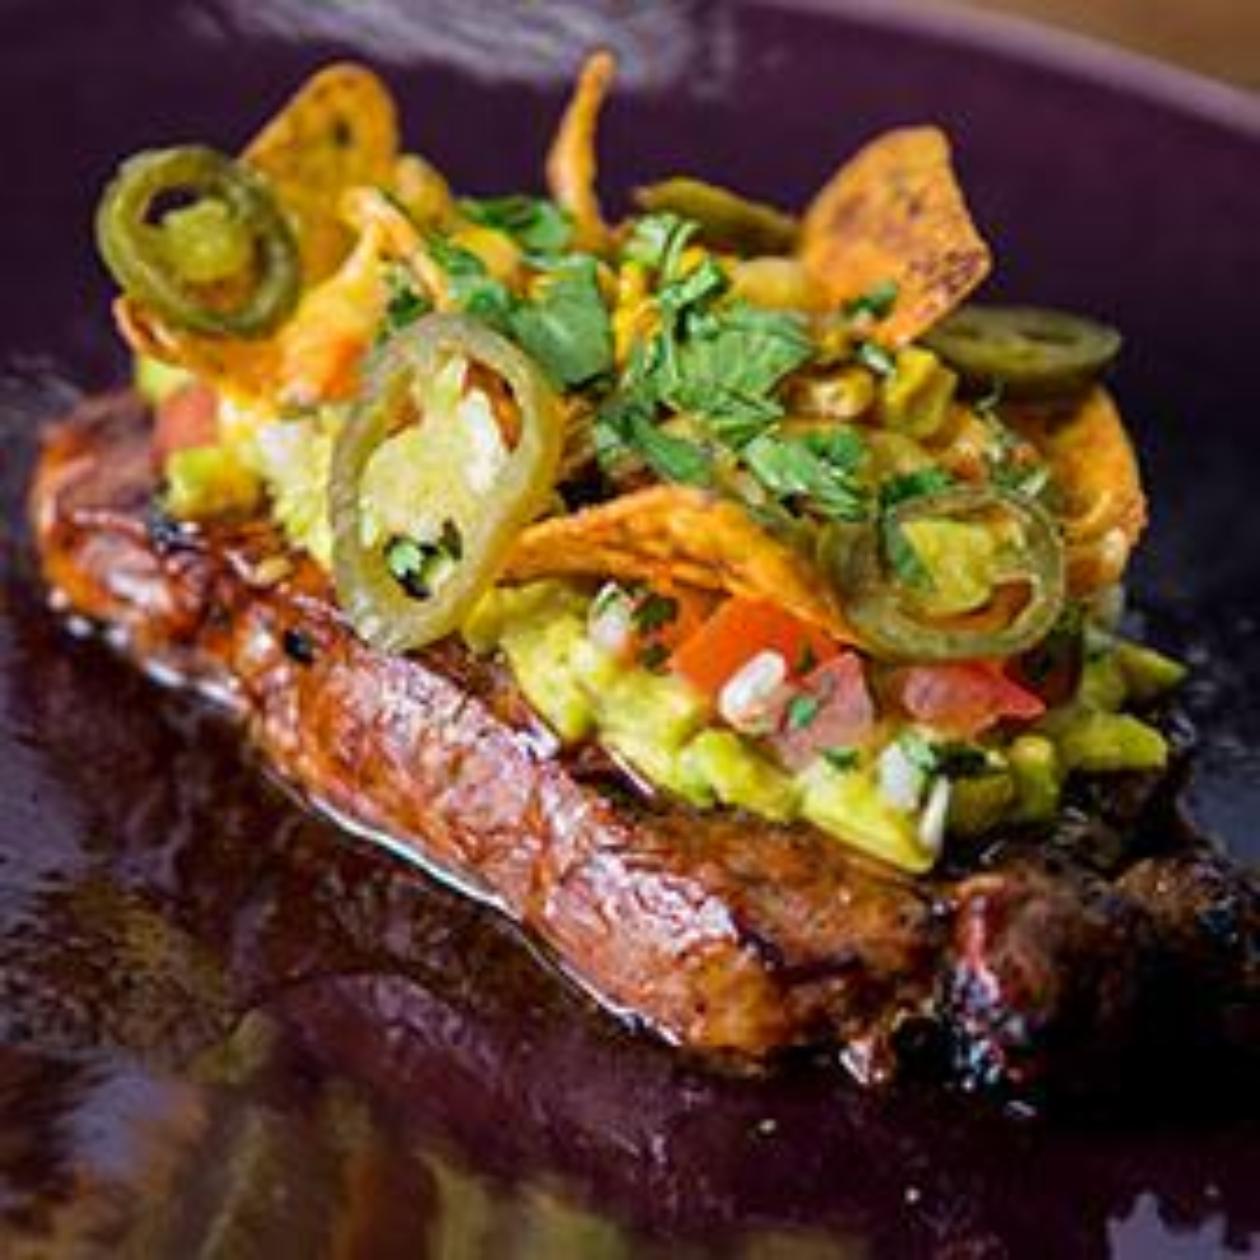 Guac-a-Salsa Dressed Rib Eye Steak